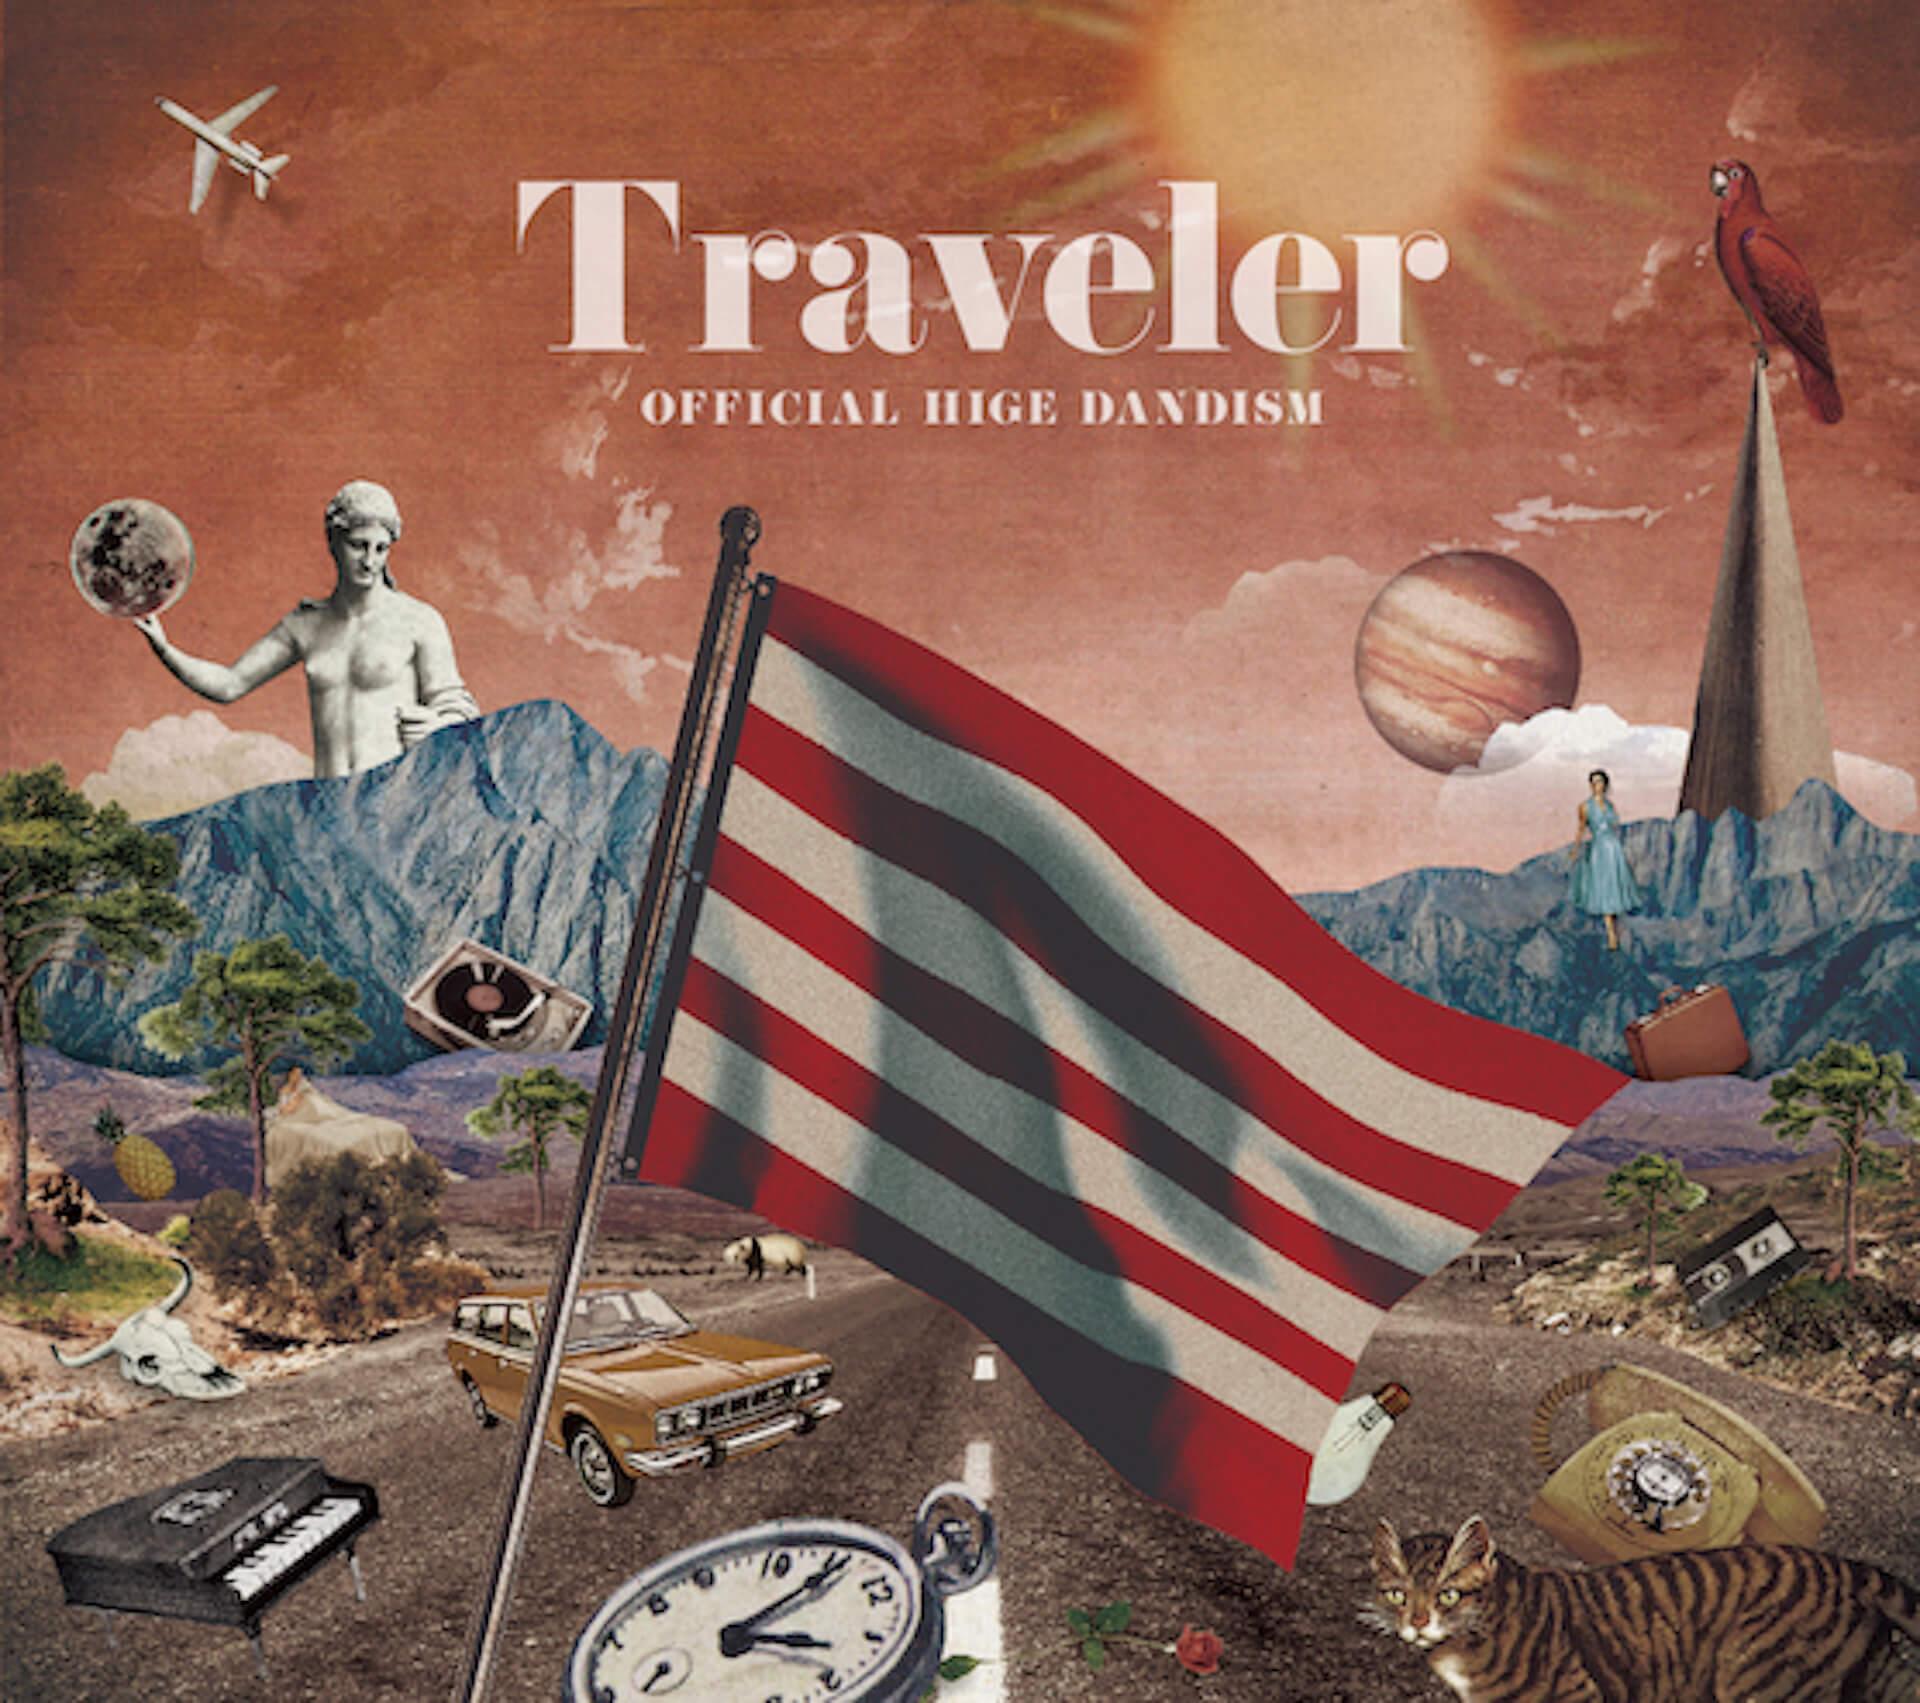 Official髭男dismメンバーが語る『Traveler』の魅力は?ダイジェスト映像&オフィシャルインタビューが公開! music191008_officialhigedandism_3